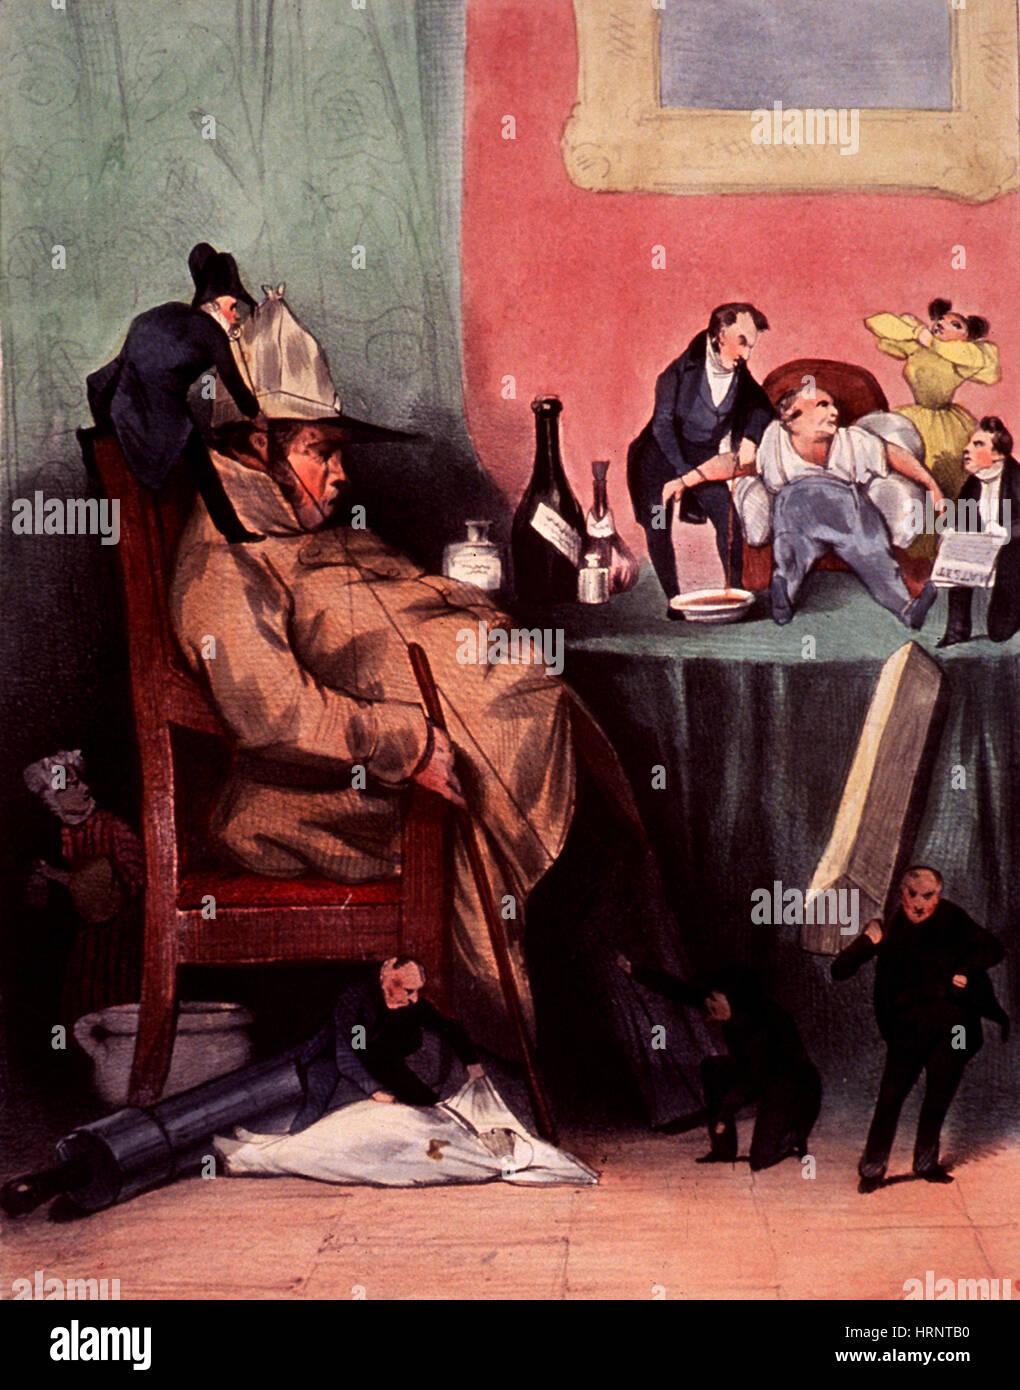 Caricature of Hypochondriac, 1833 - Stock Image